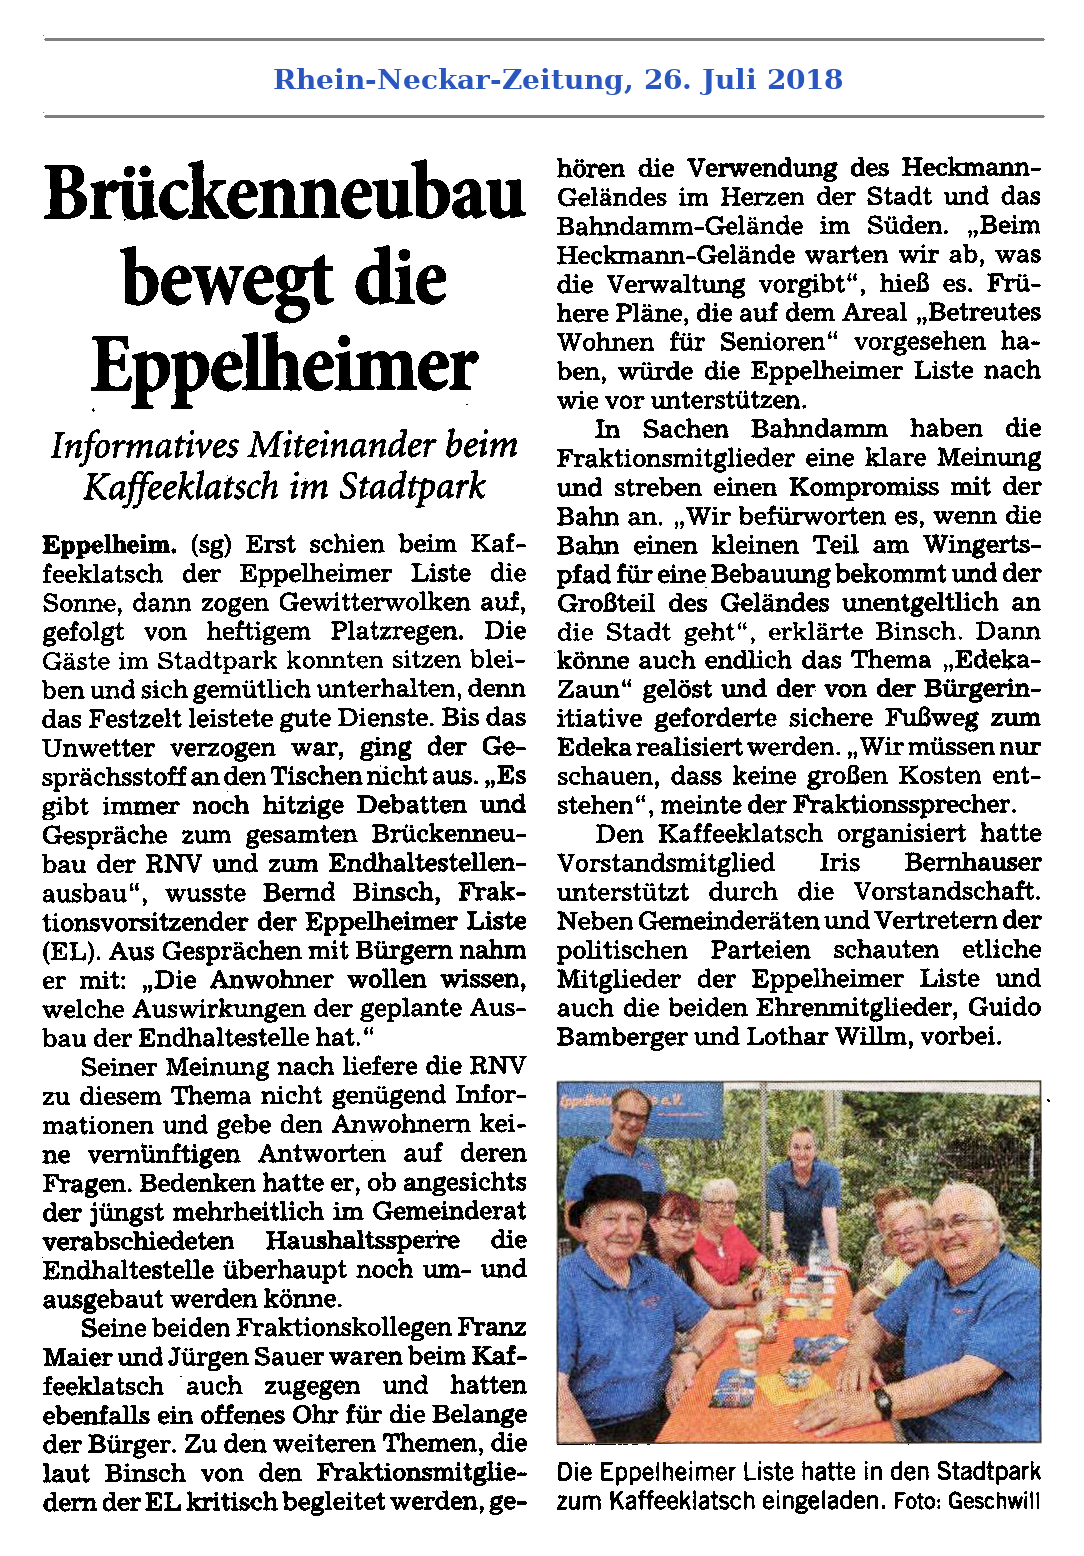 "Rhein-Neckar-Zeitung, 26. Juli 2018: Kaffeeklatsch – ""Brückenneubau bewegt die Eppelheimer"""